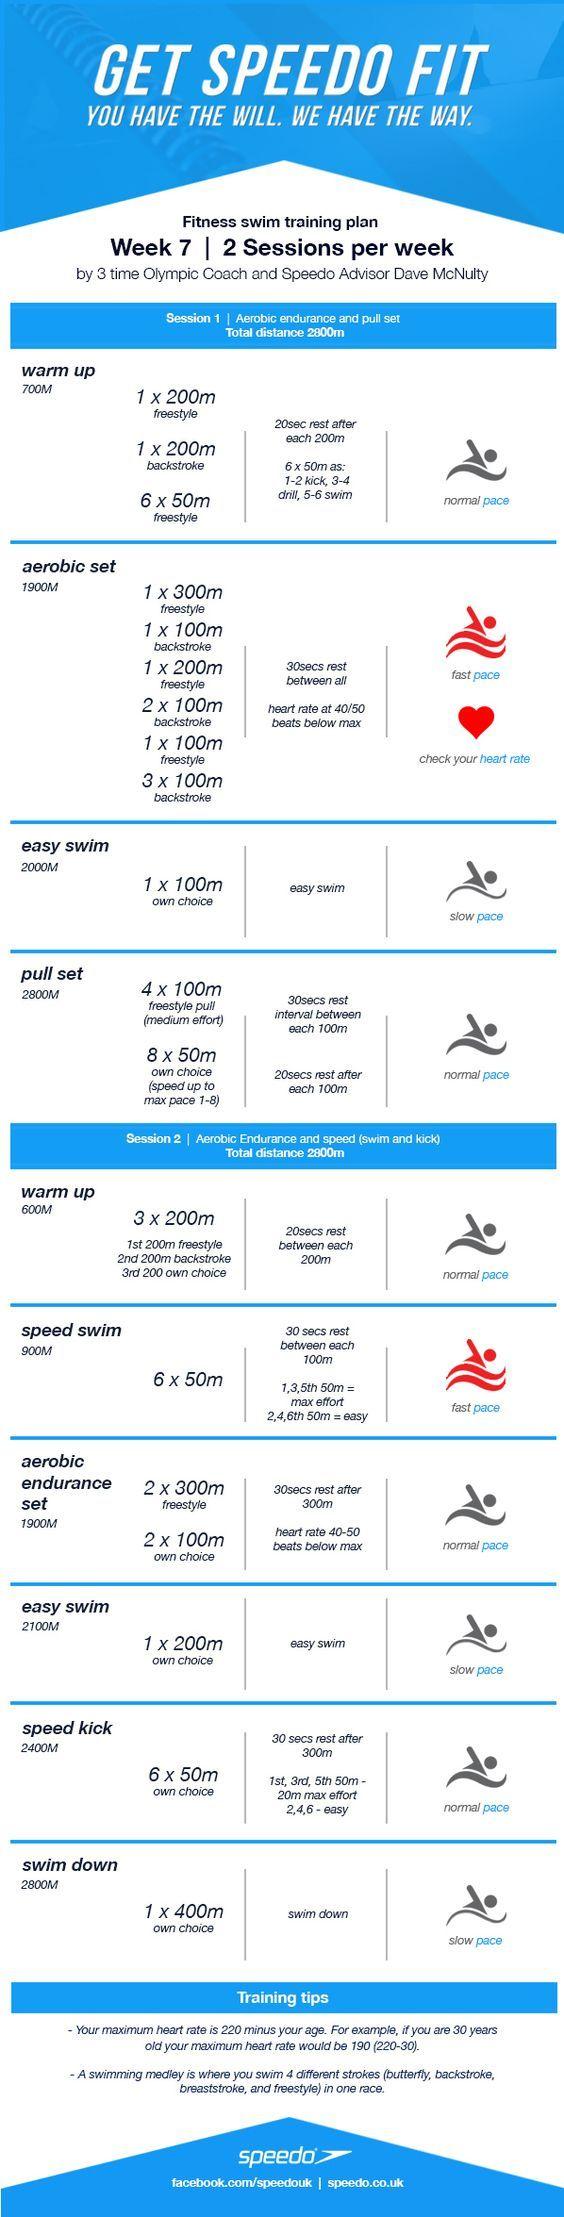 Speedo Swim Fitness Training Plan (Week 7 of 8)